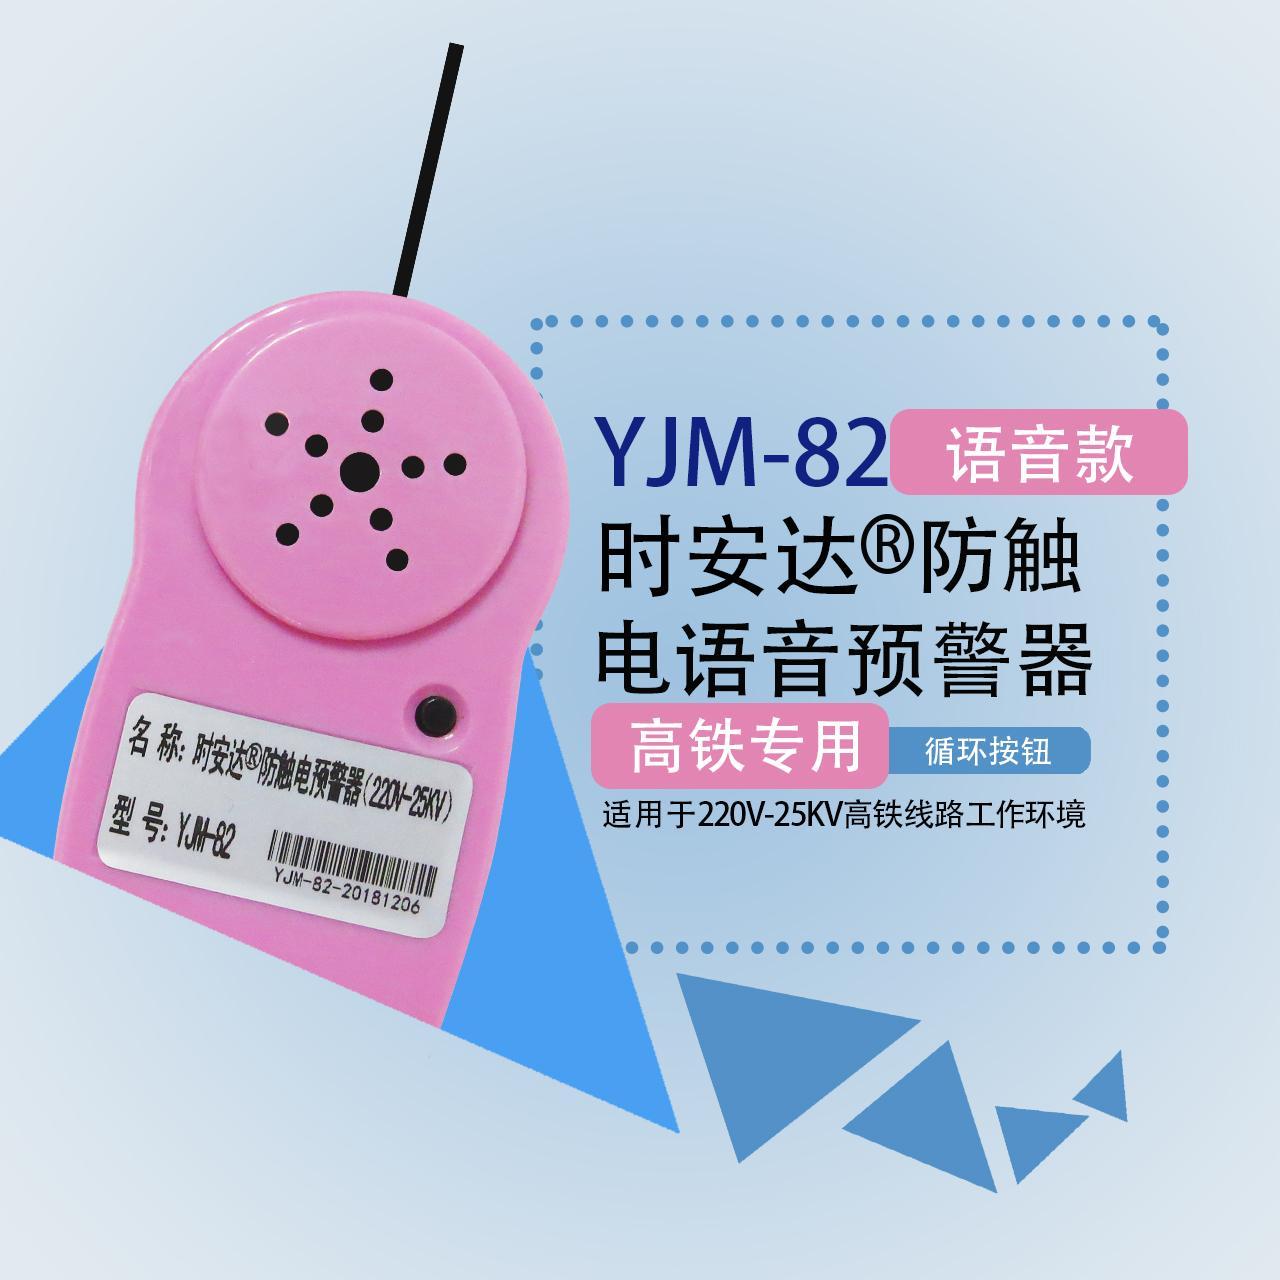 YJM-82时安达®防触电预警器 3